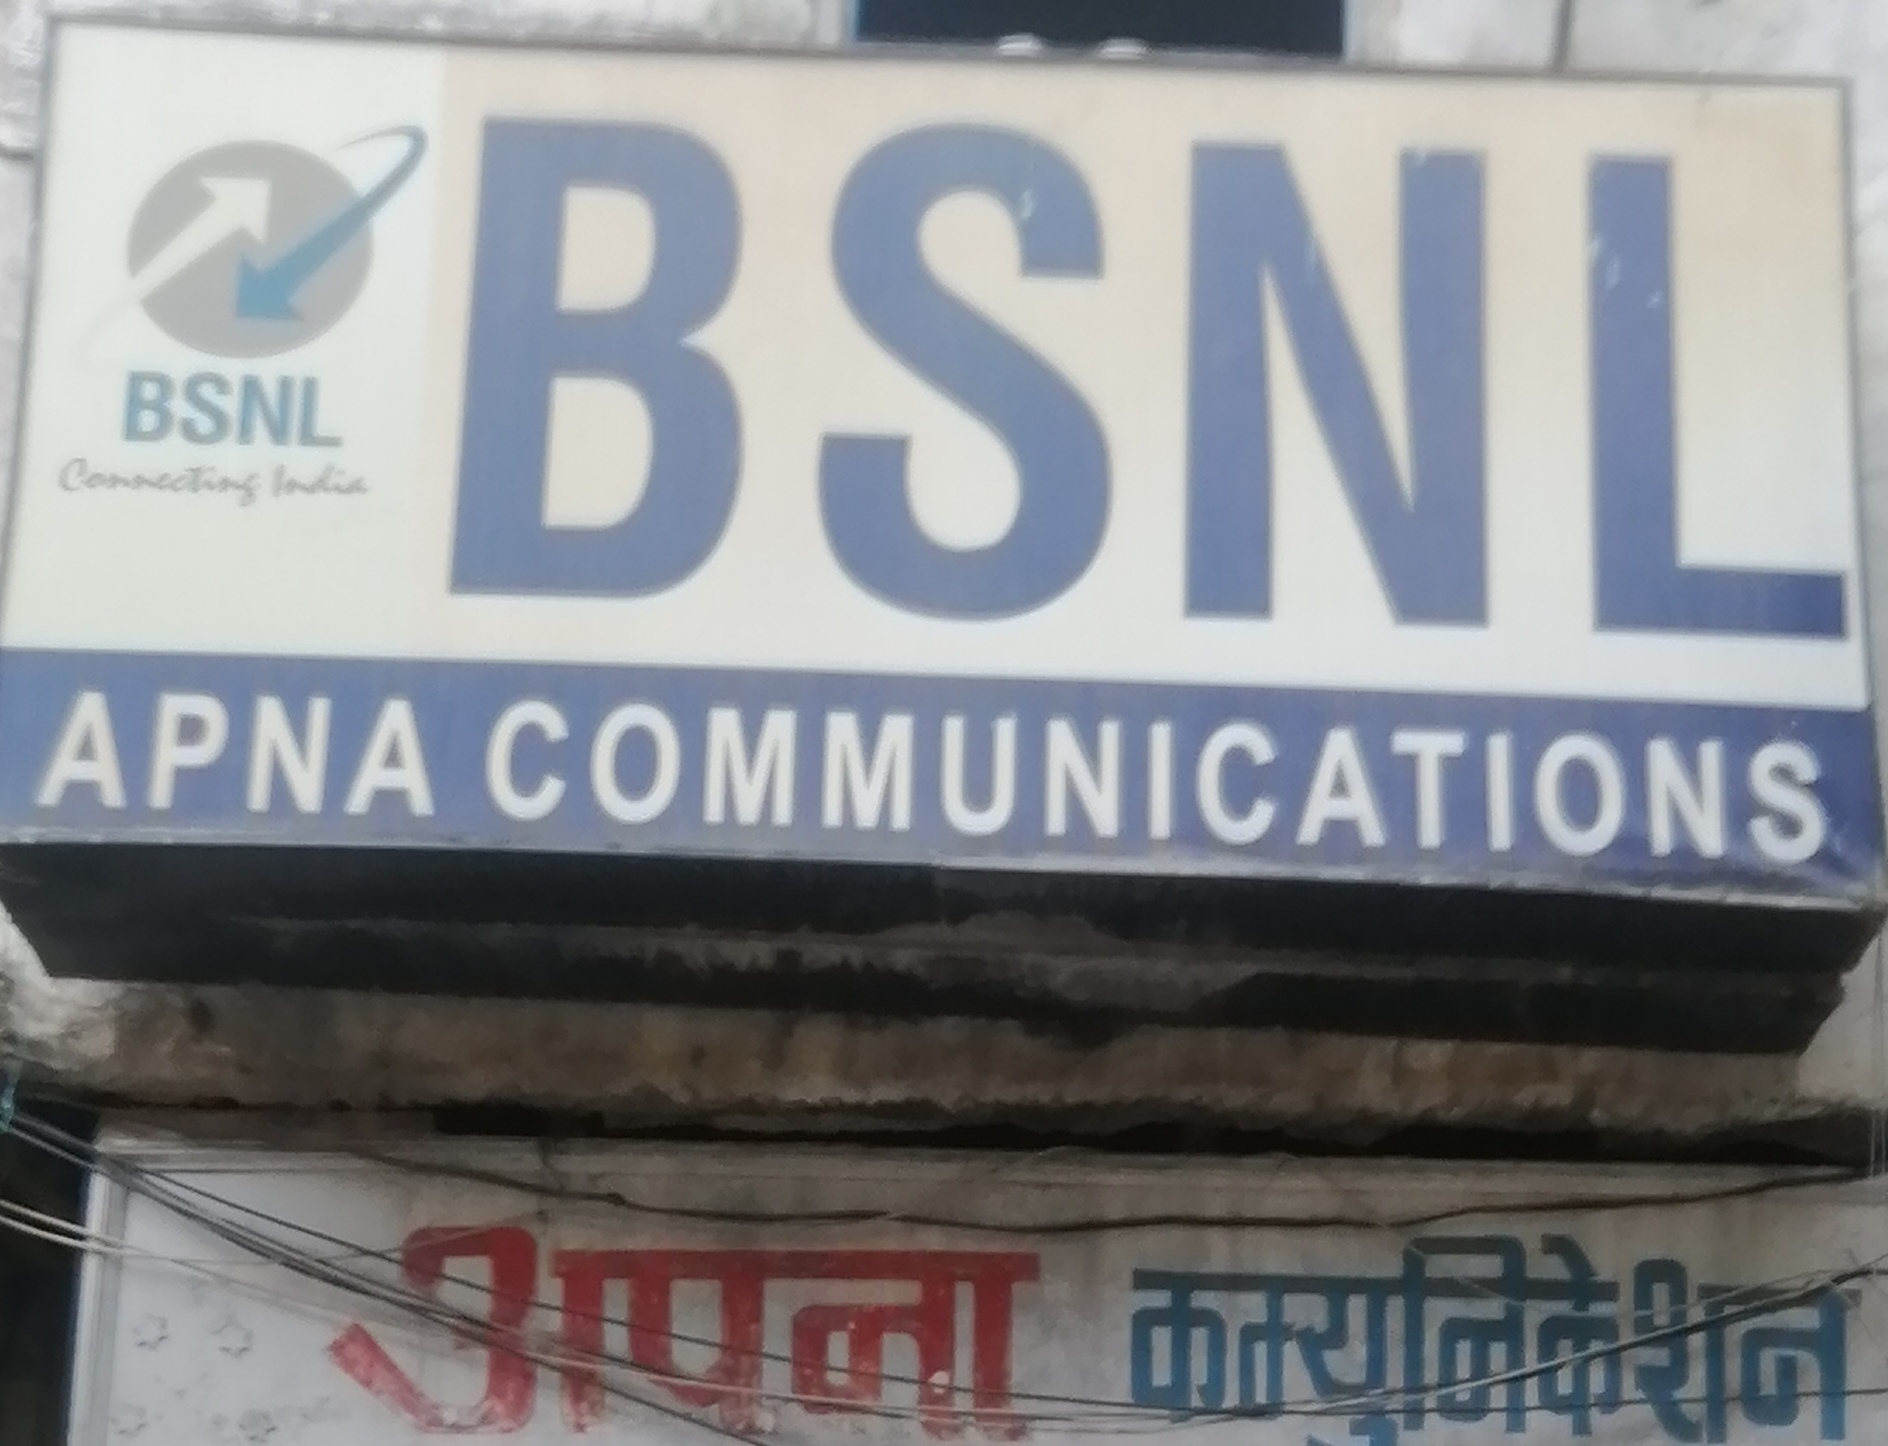 Apna Communication